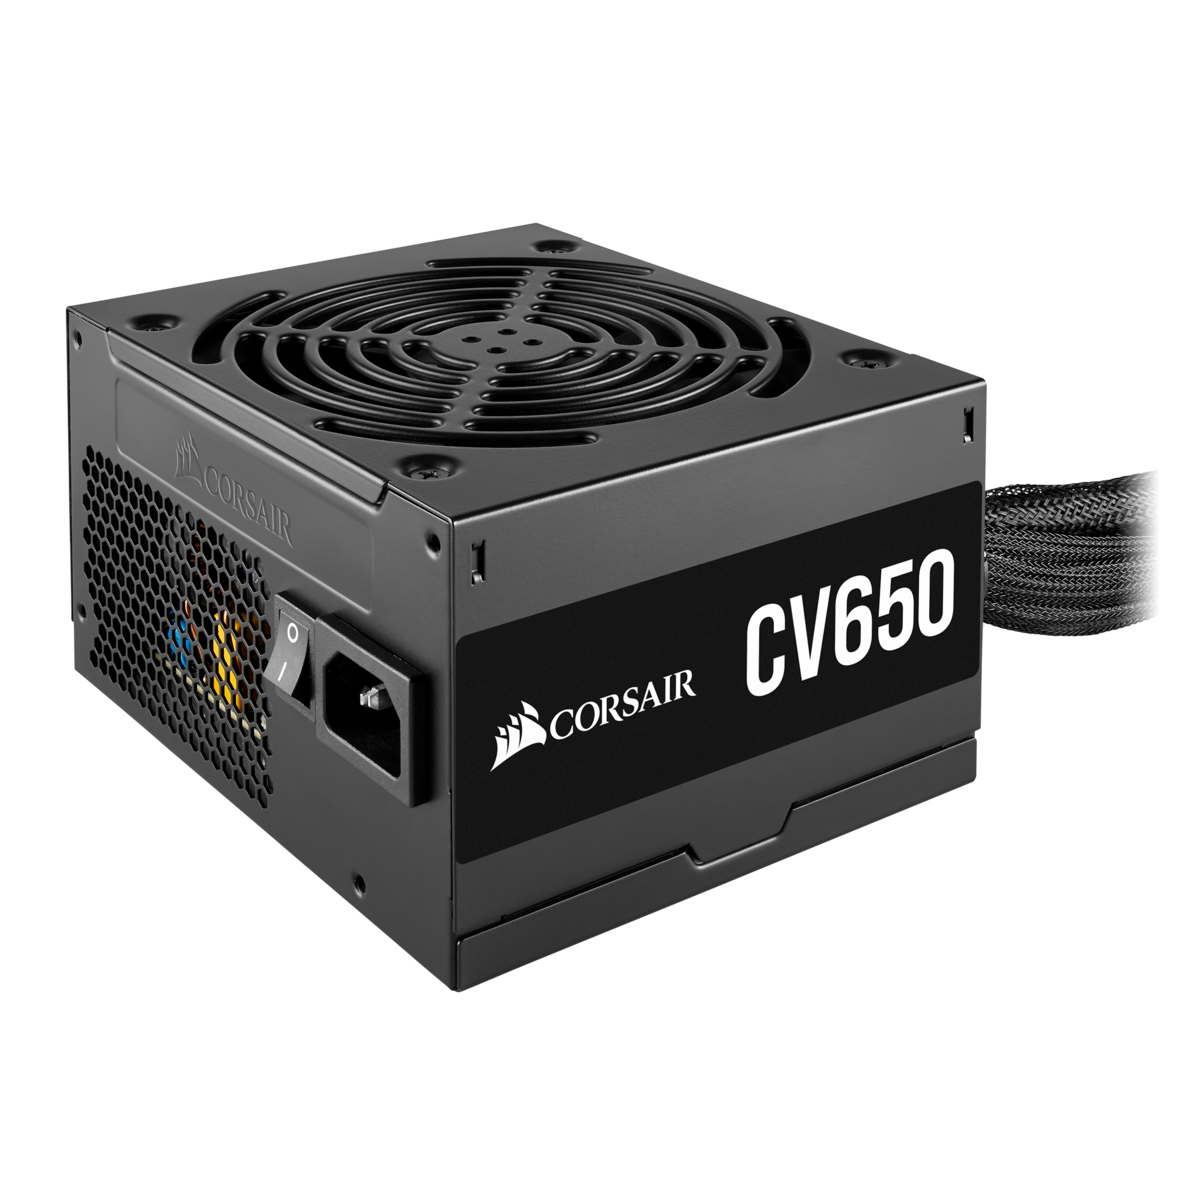 Fonte Corsair ATX CV650 650W, 80 Plus Bronze, PFC Ativo, CP-9020211-BR